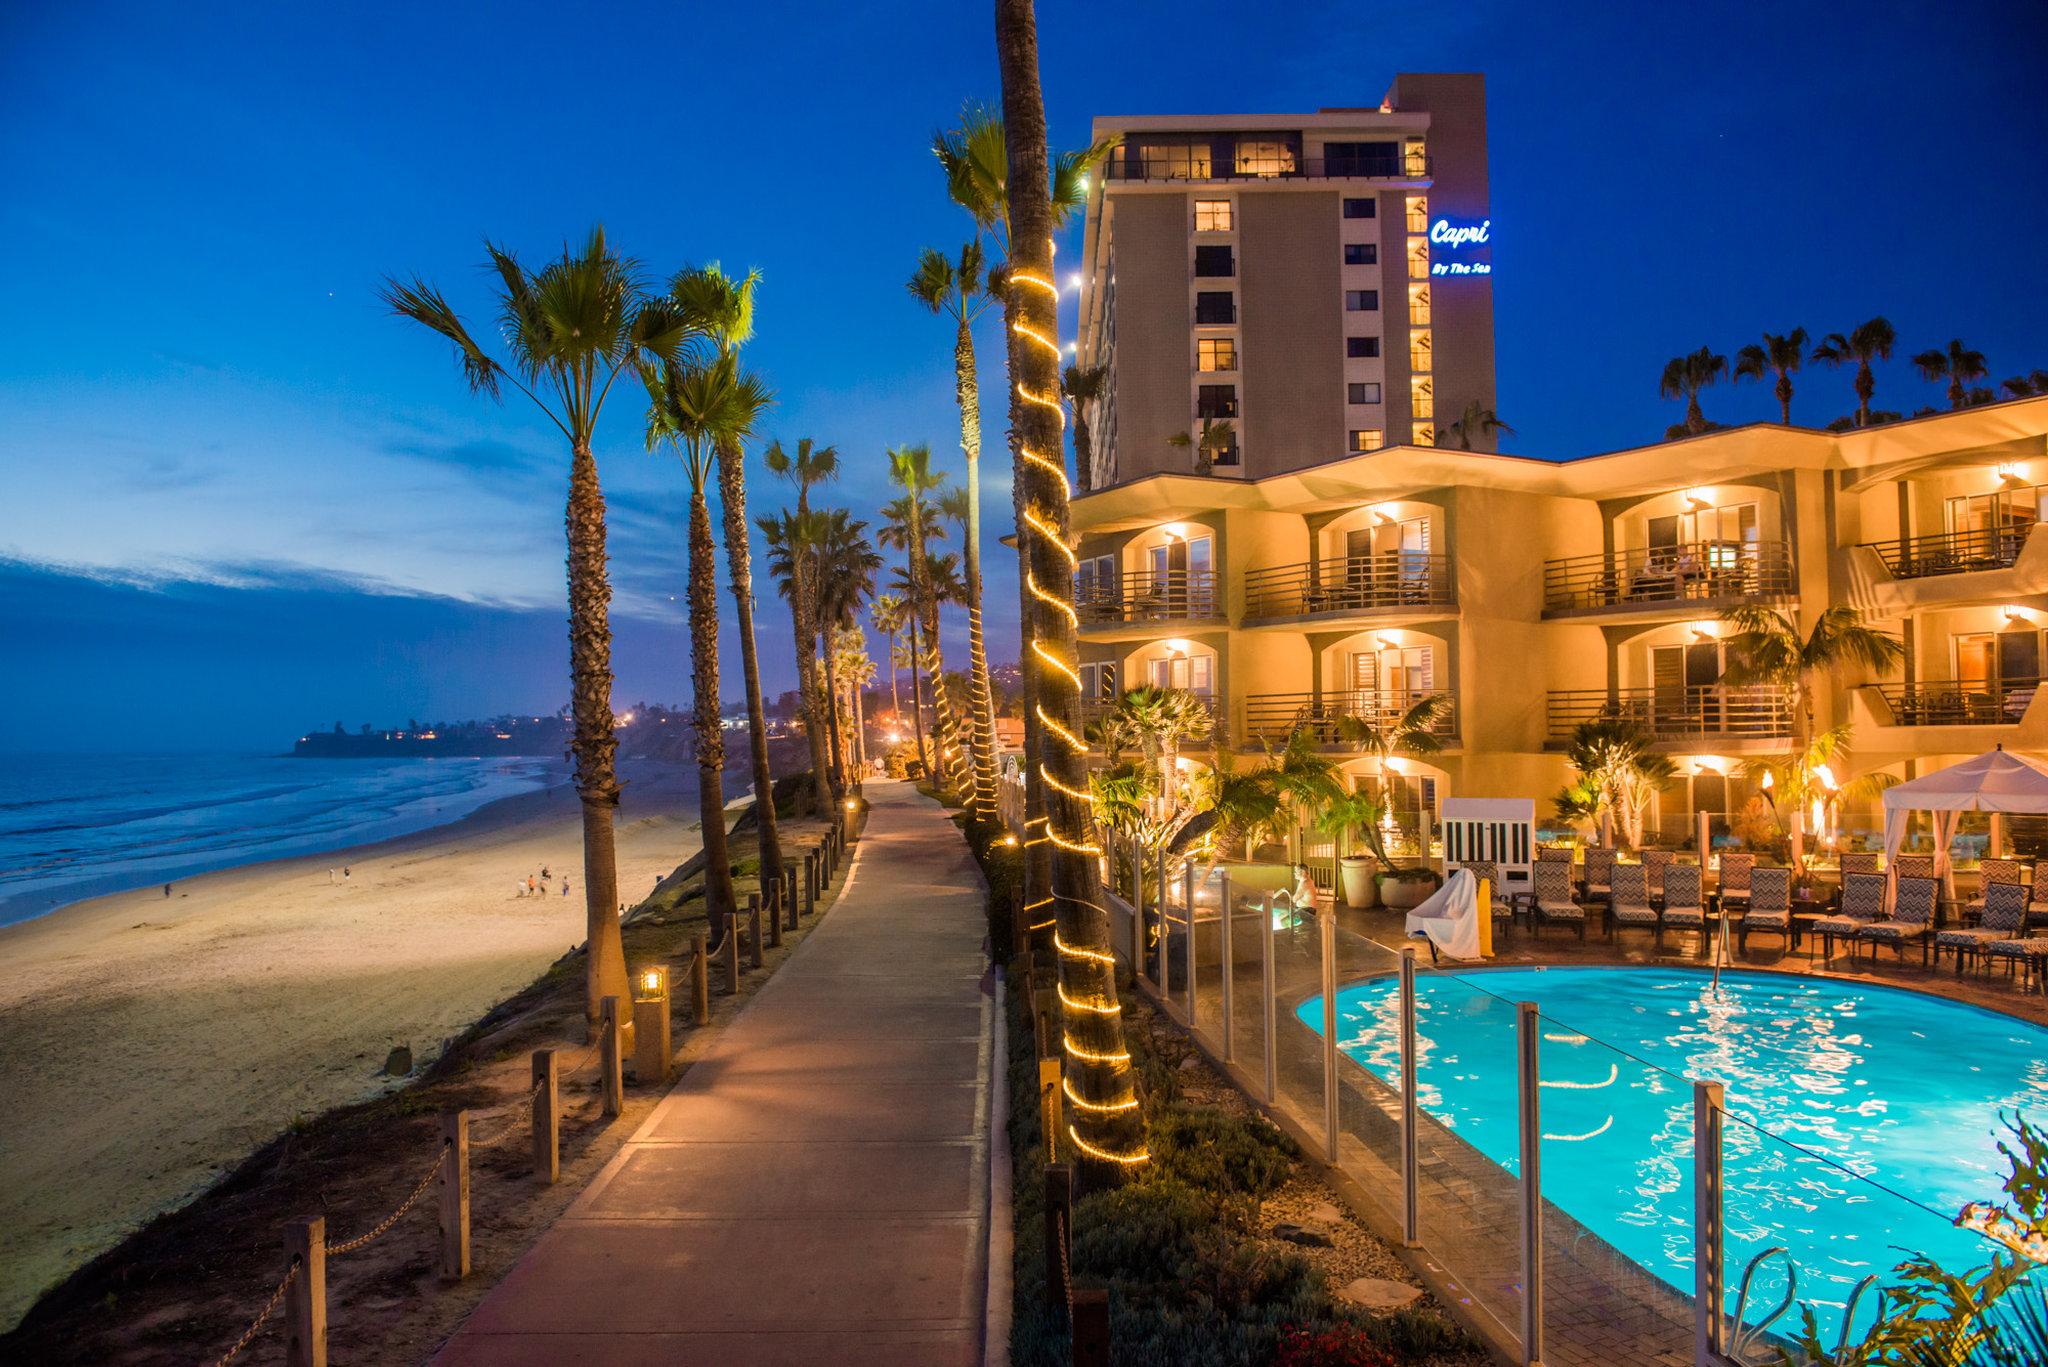 Pacific Terrace Hotel Deals